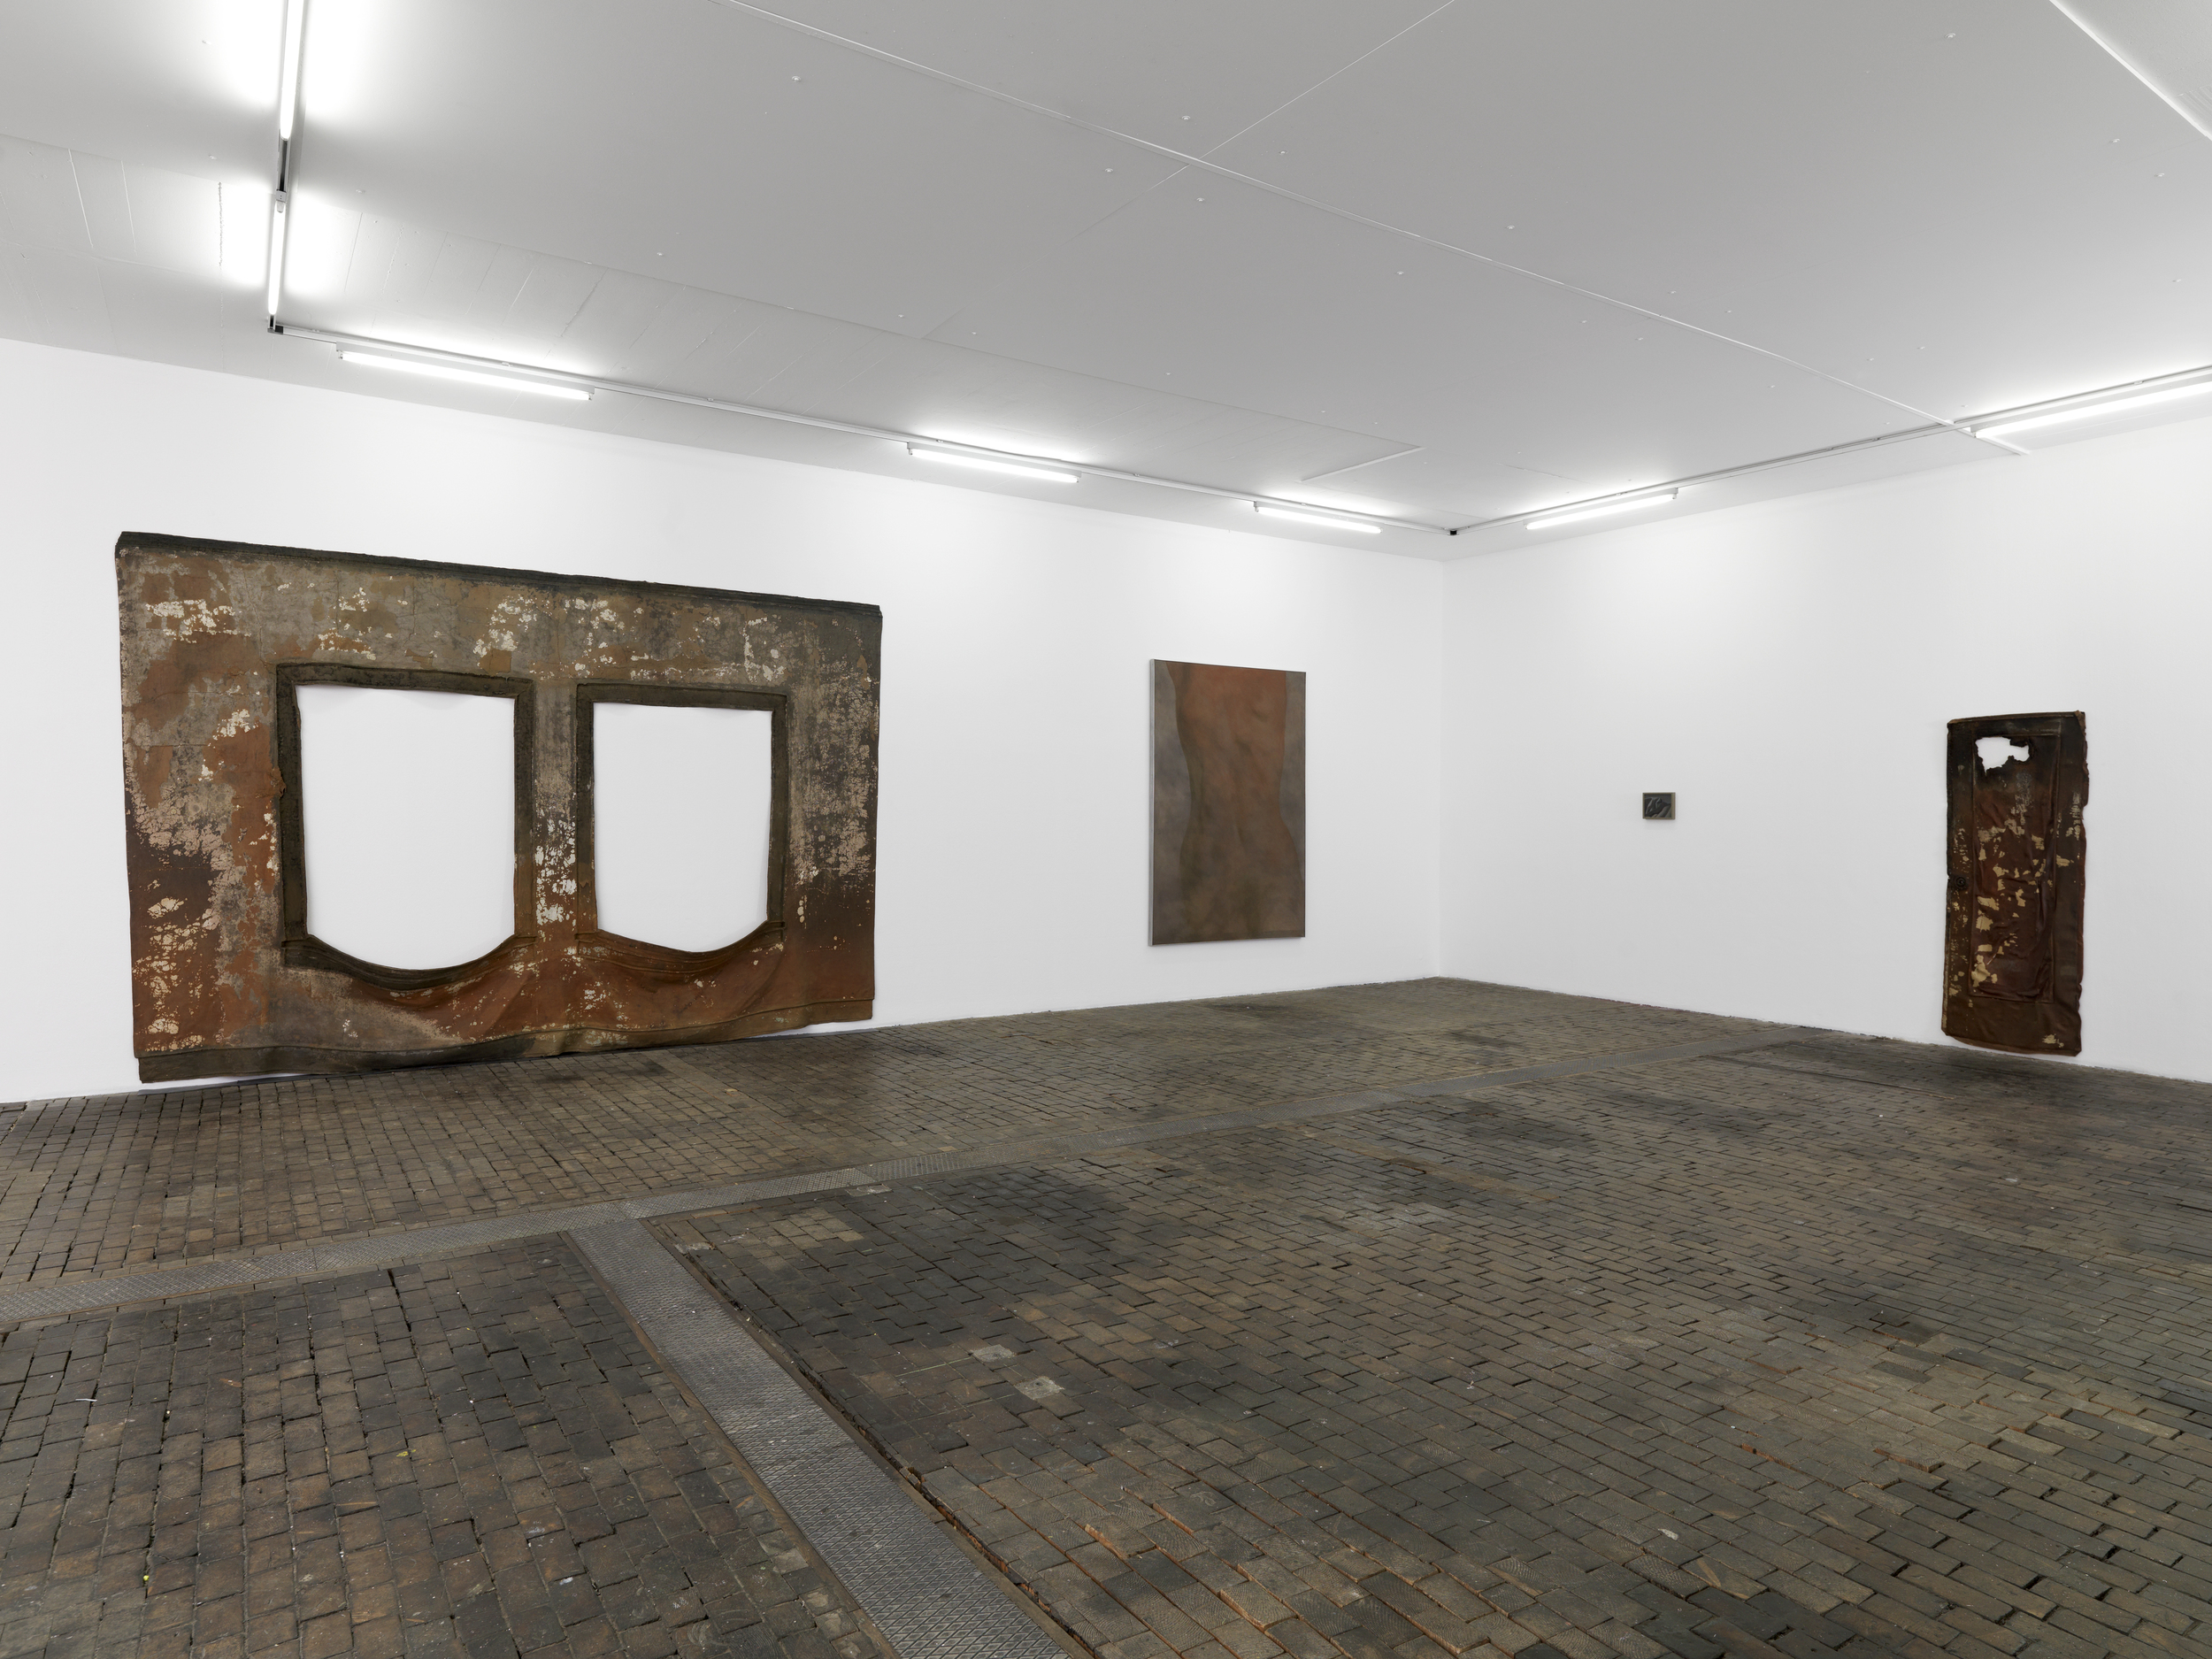 Centre d'Art Contemporain, Geneva - Robert Overby - 2014